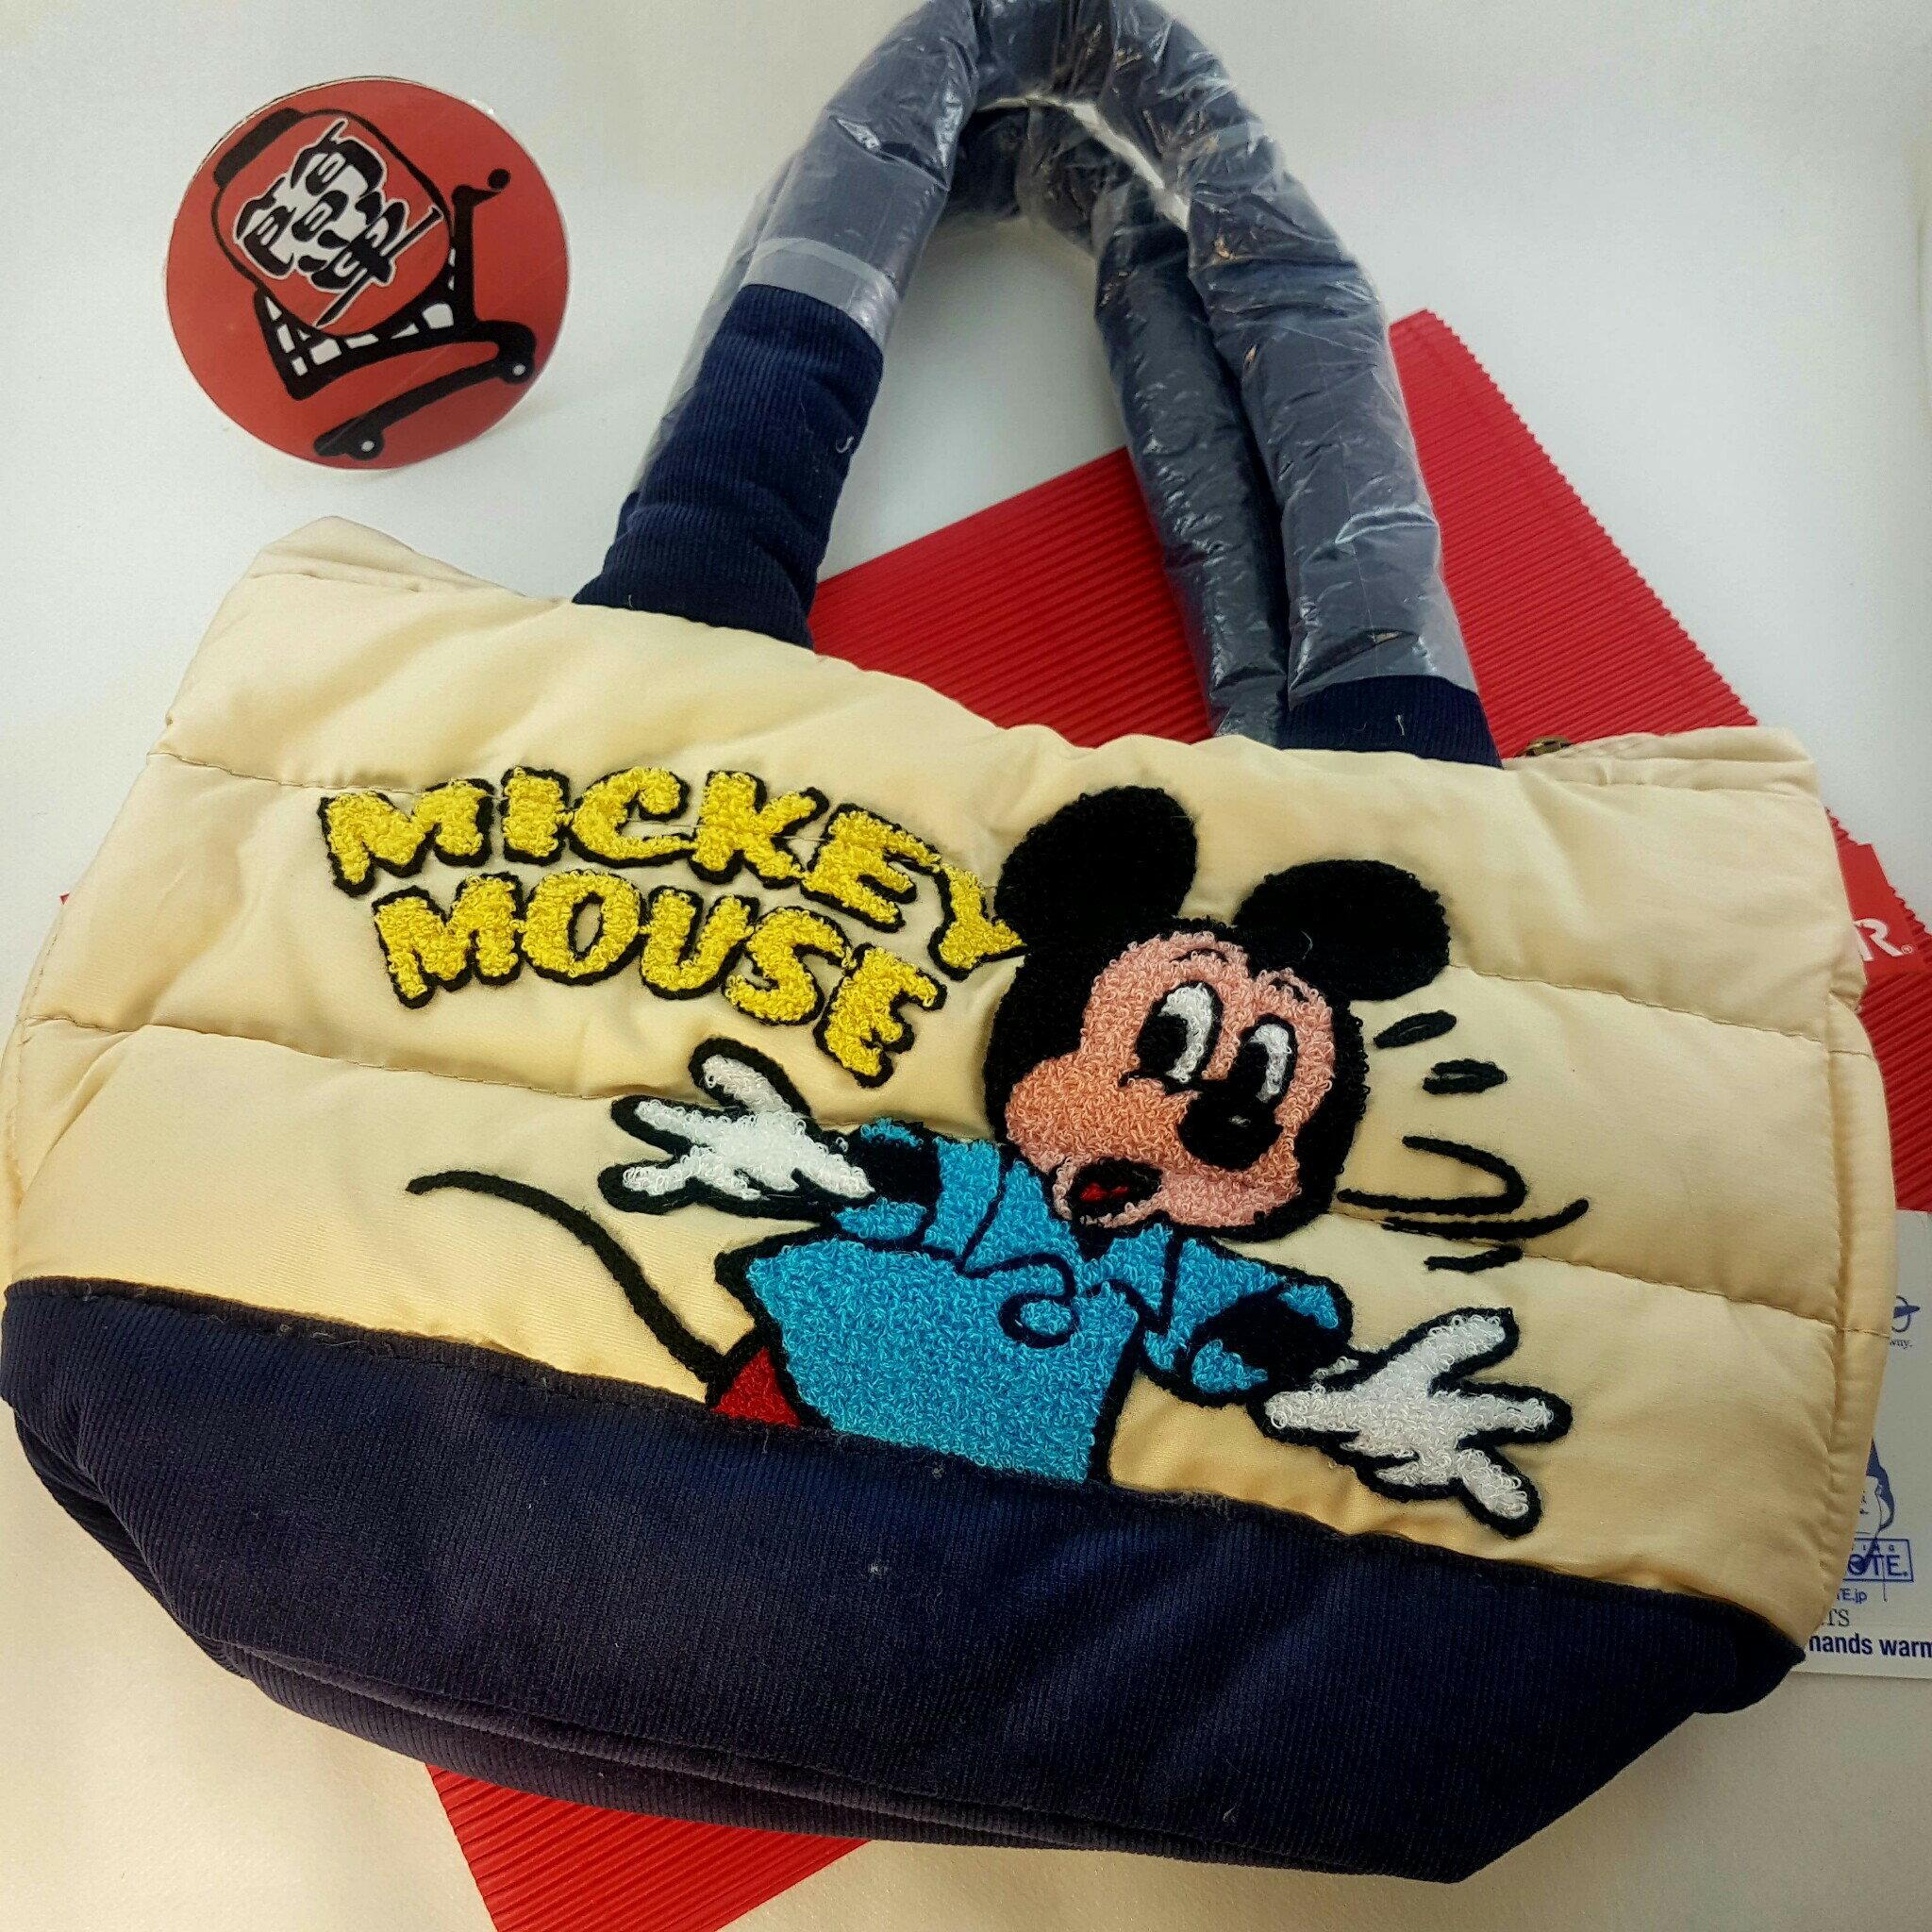 『日本代購品』 ROOTOTE 米奇 刺繡空氣包 手拿包